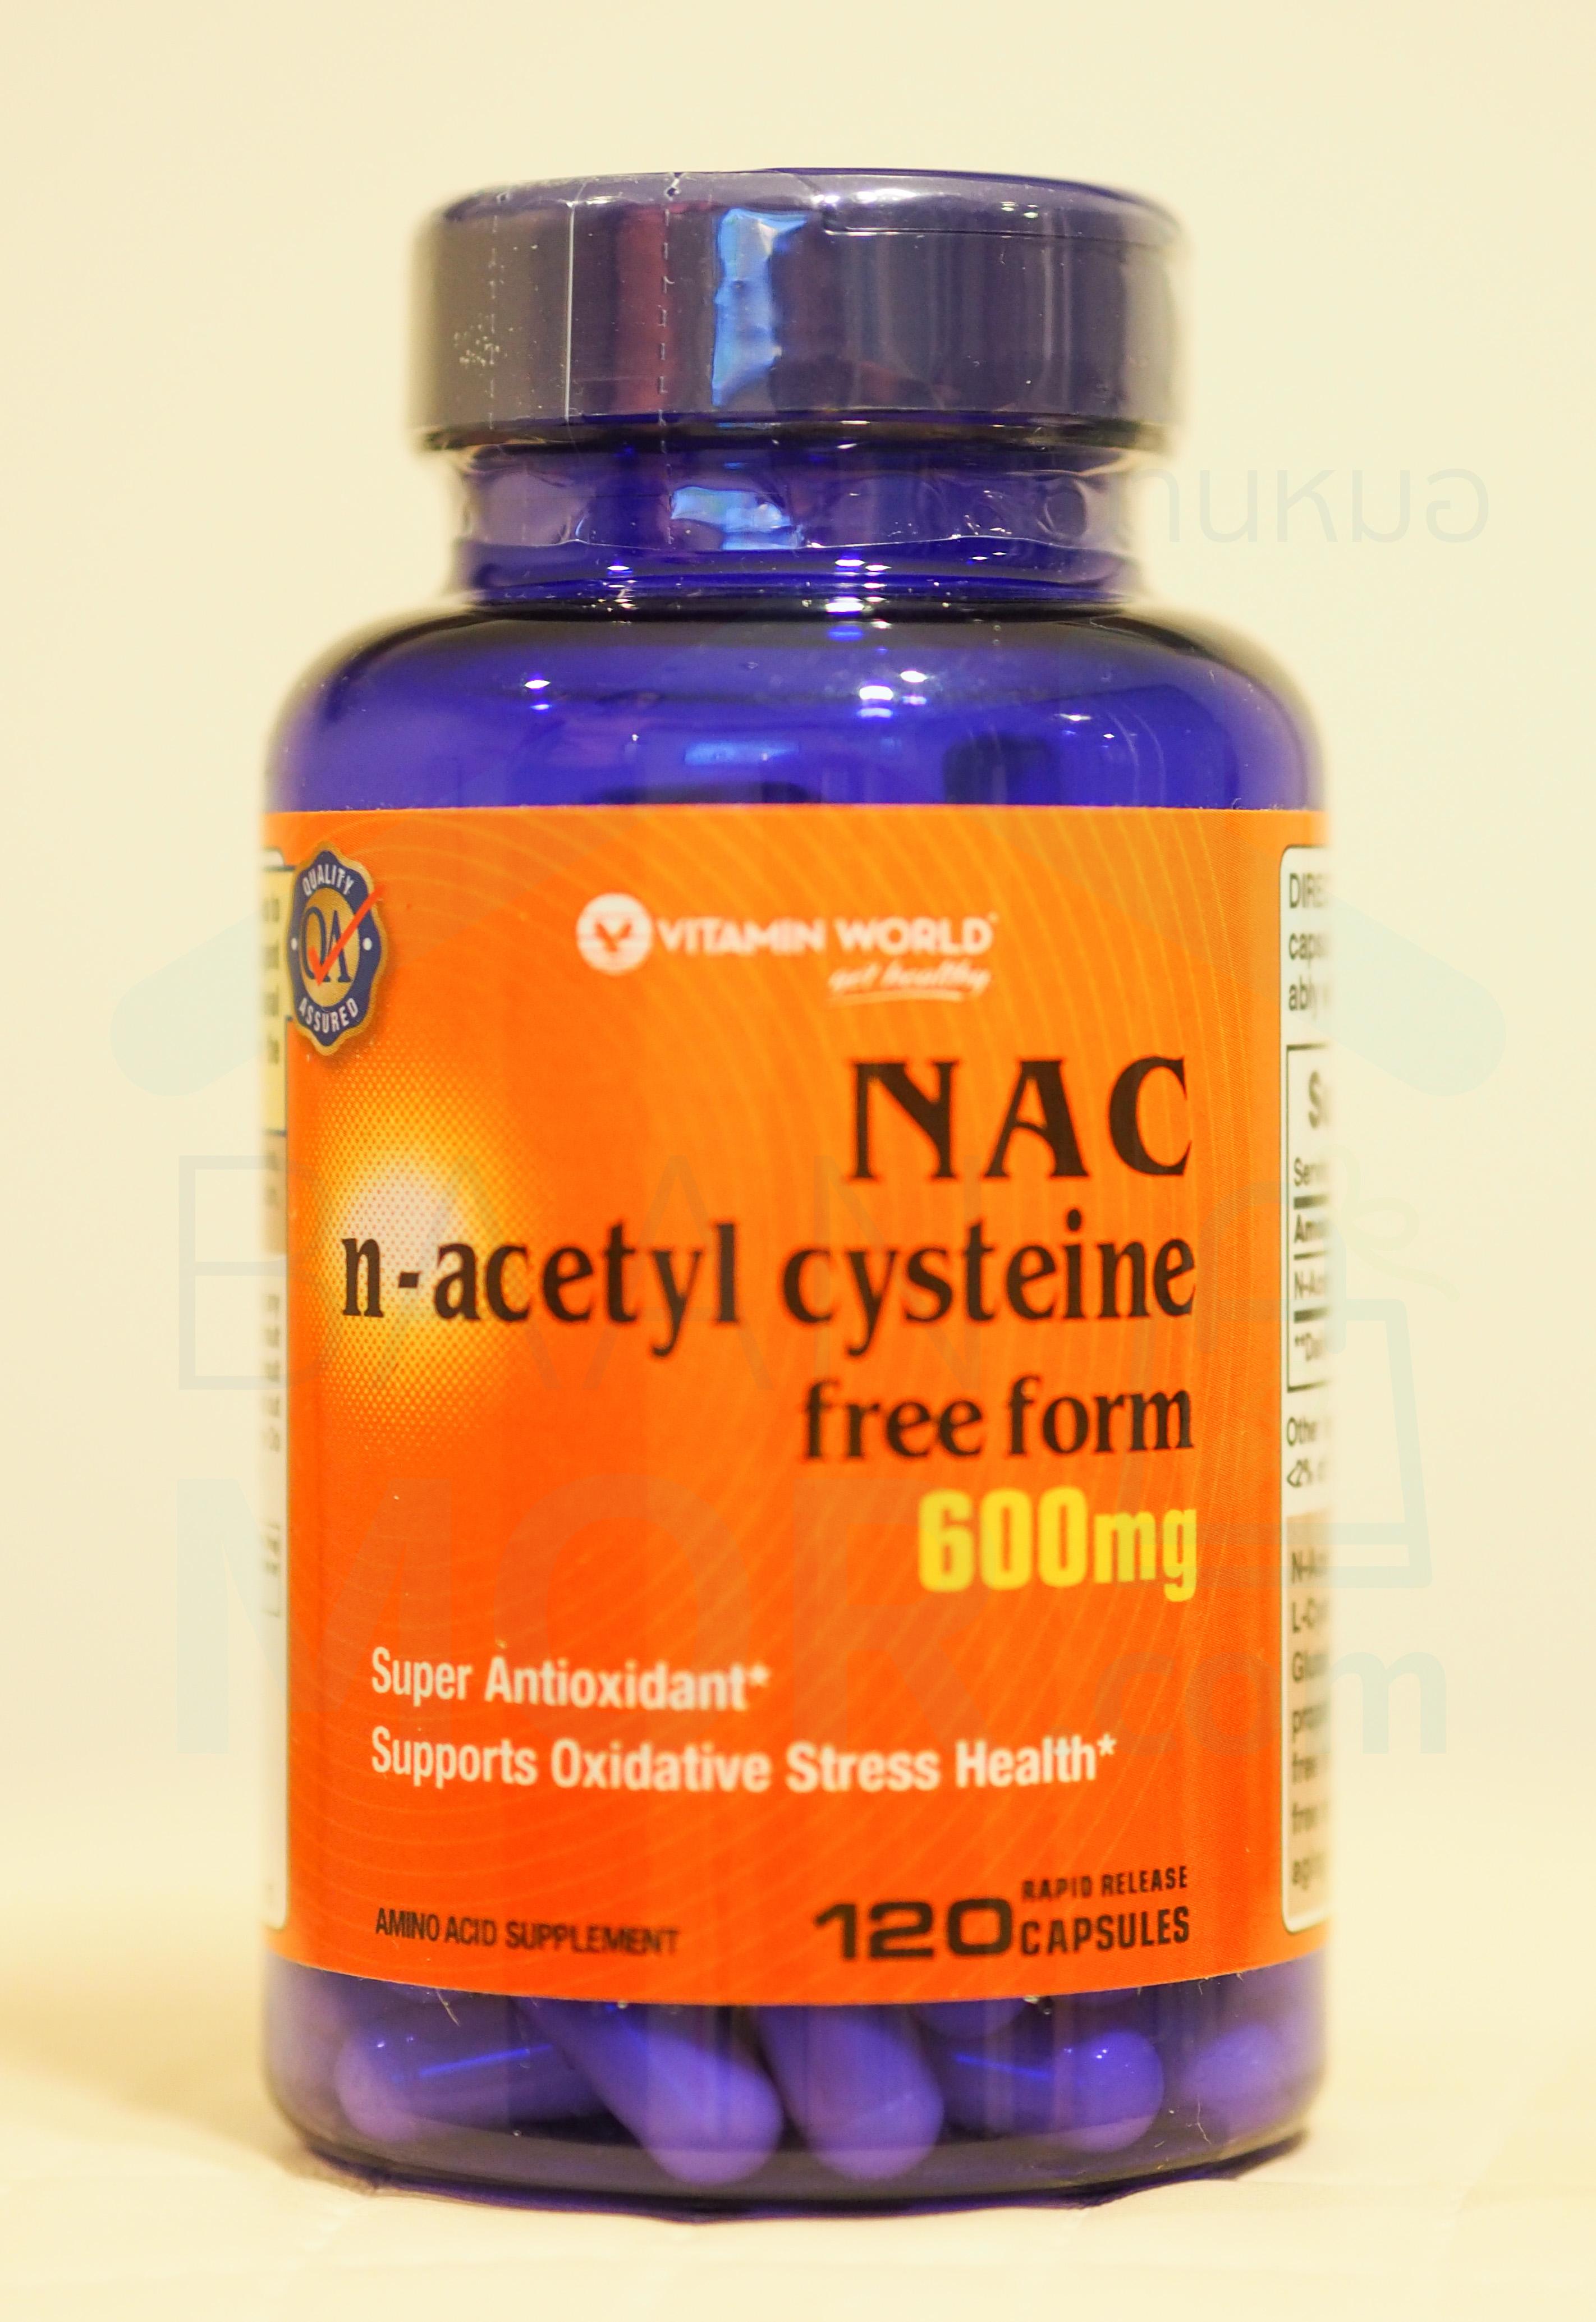 Vitamin World, N-Acetyl Cysteine 600mg สารตั้งต้นของกลูต้าไธโอน เป็นสารต้านอนุมูลอิสระ ช่วยตับในการทำลายและขจัดสารพิษออกจากร่างกาย 1 Capsule 600 มก 1 ขวดมี 120 capsules ค่ะ